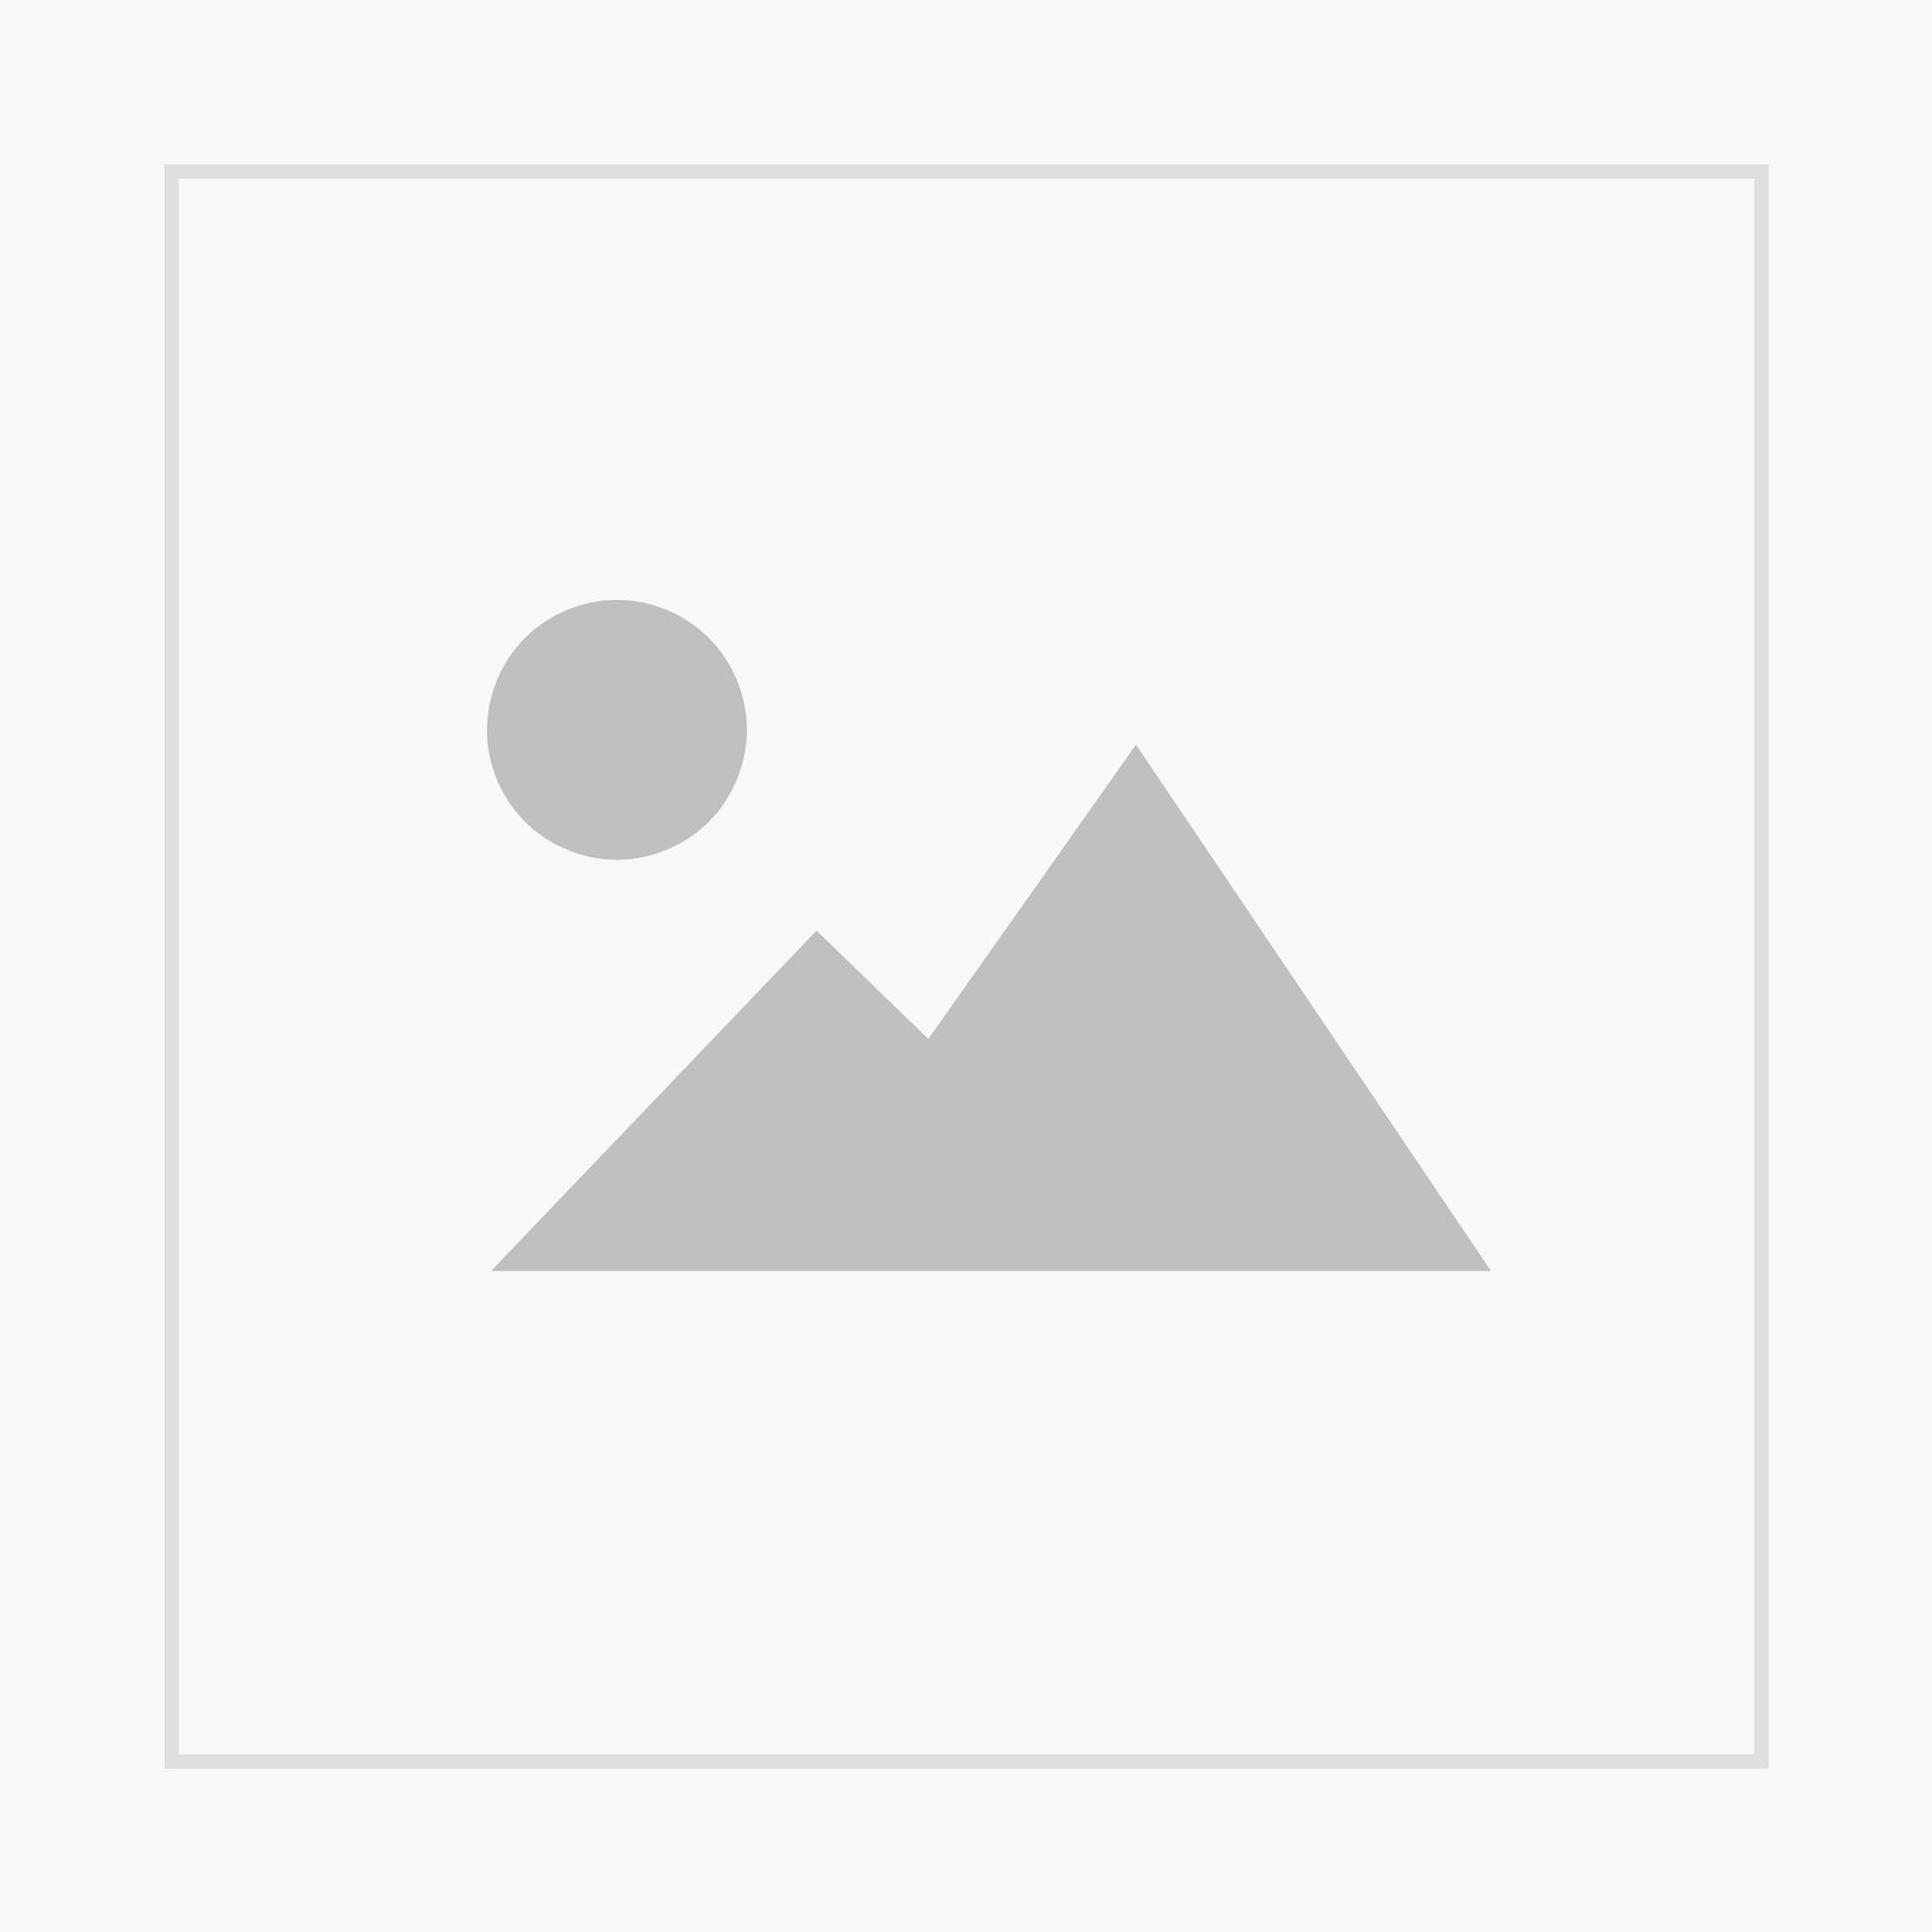 Global Register of Migratory Species - from Global to Regional Scales